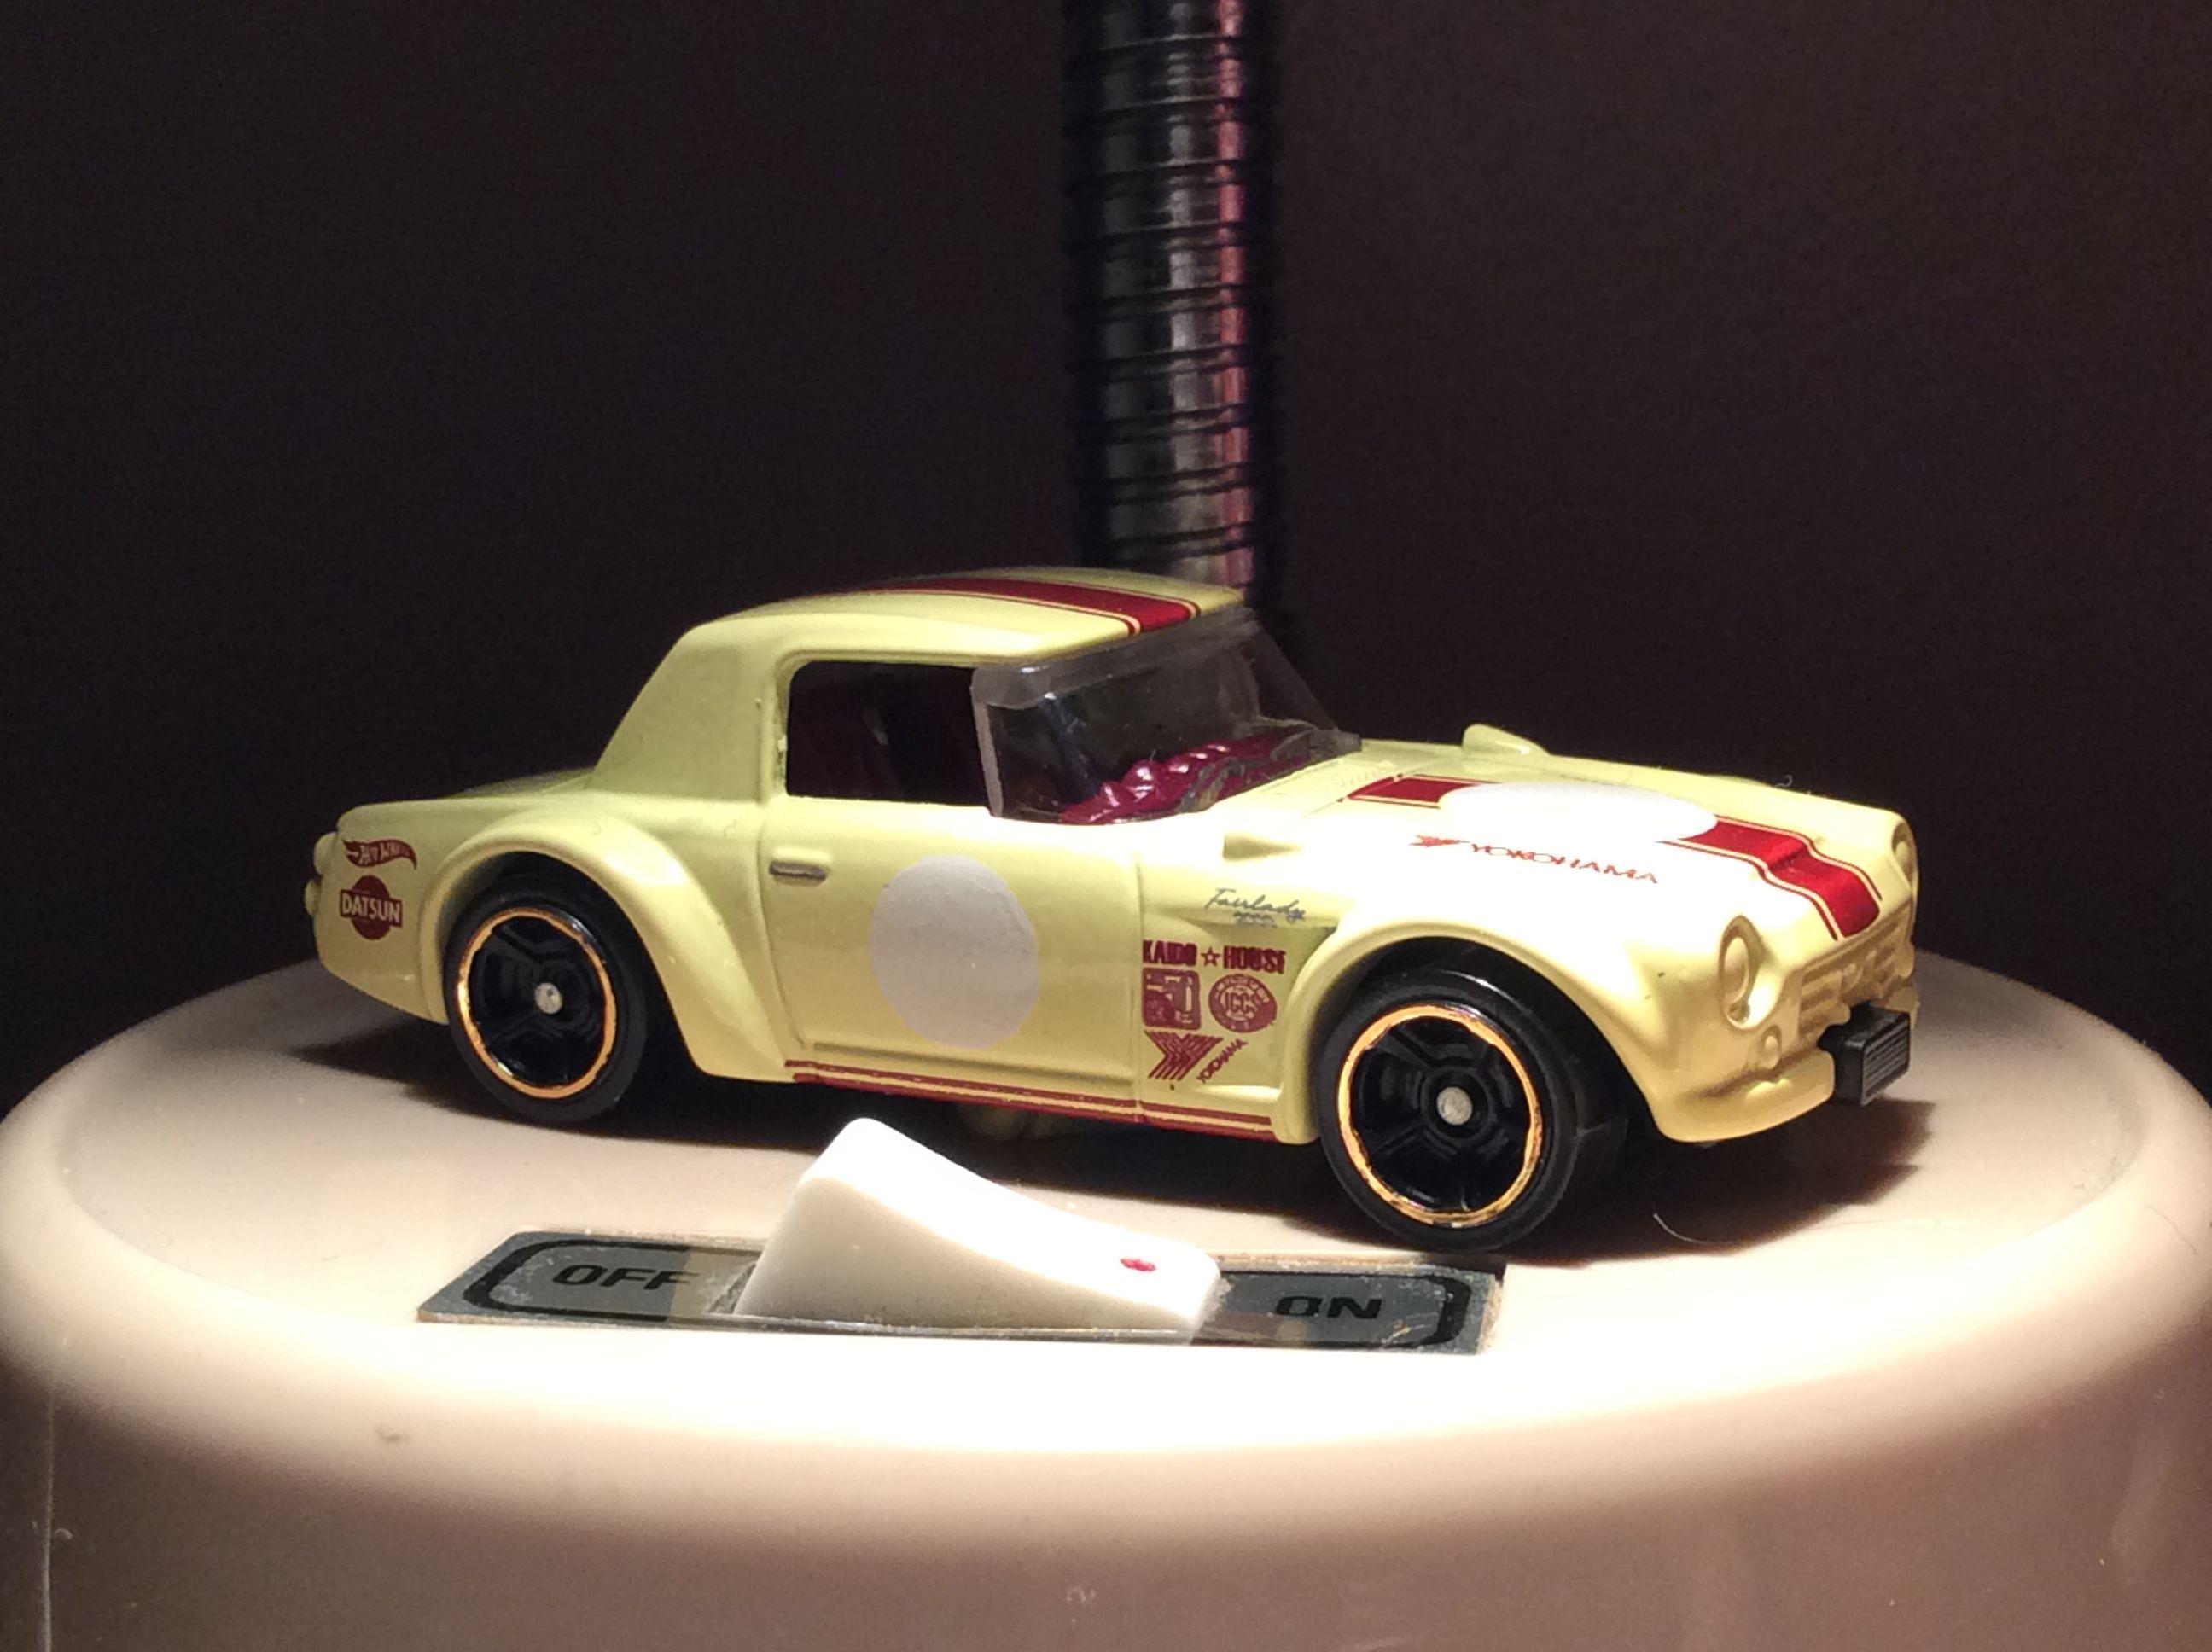 Hot wheels Datsun fair-lady 2000